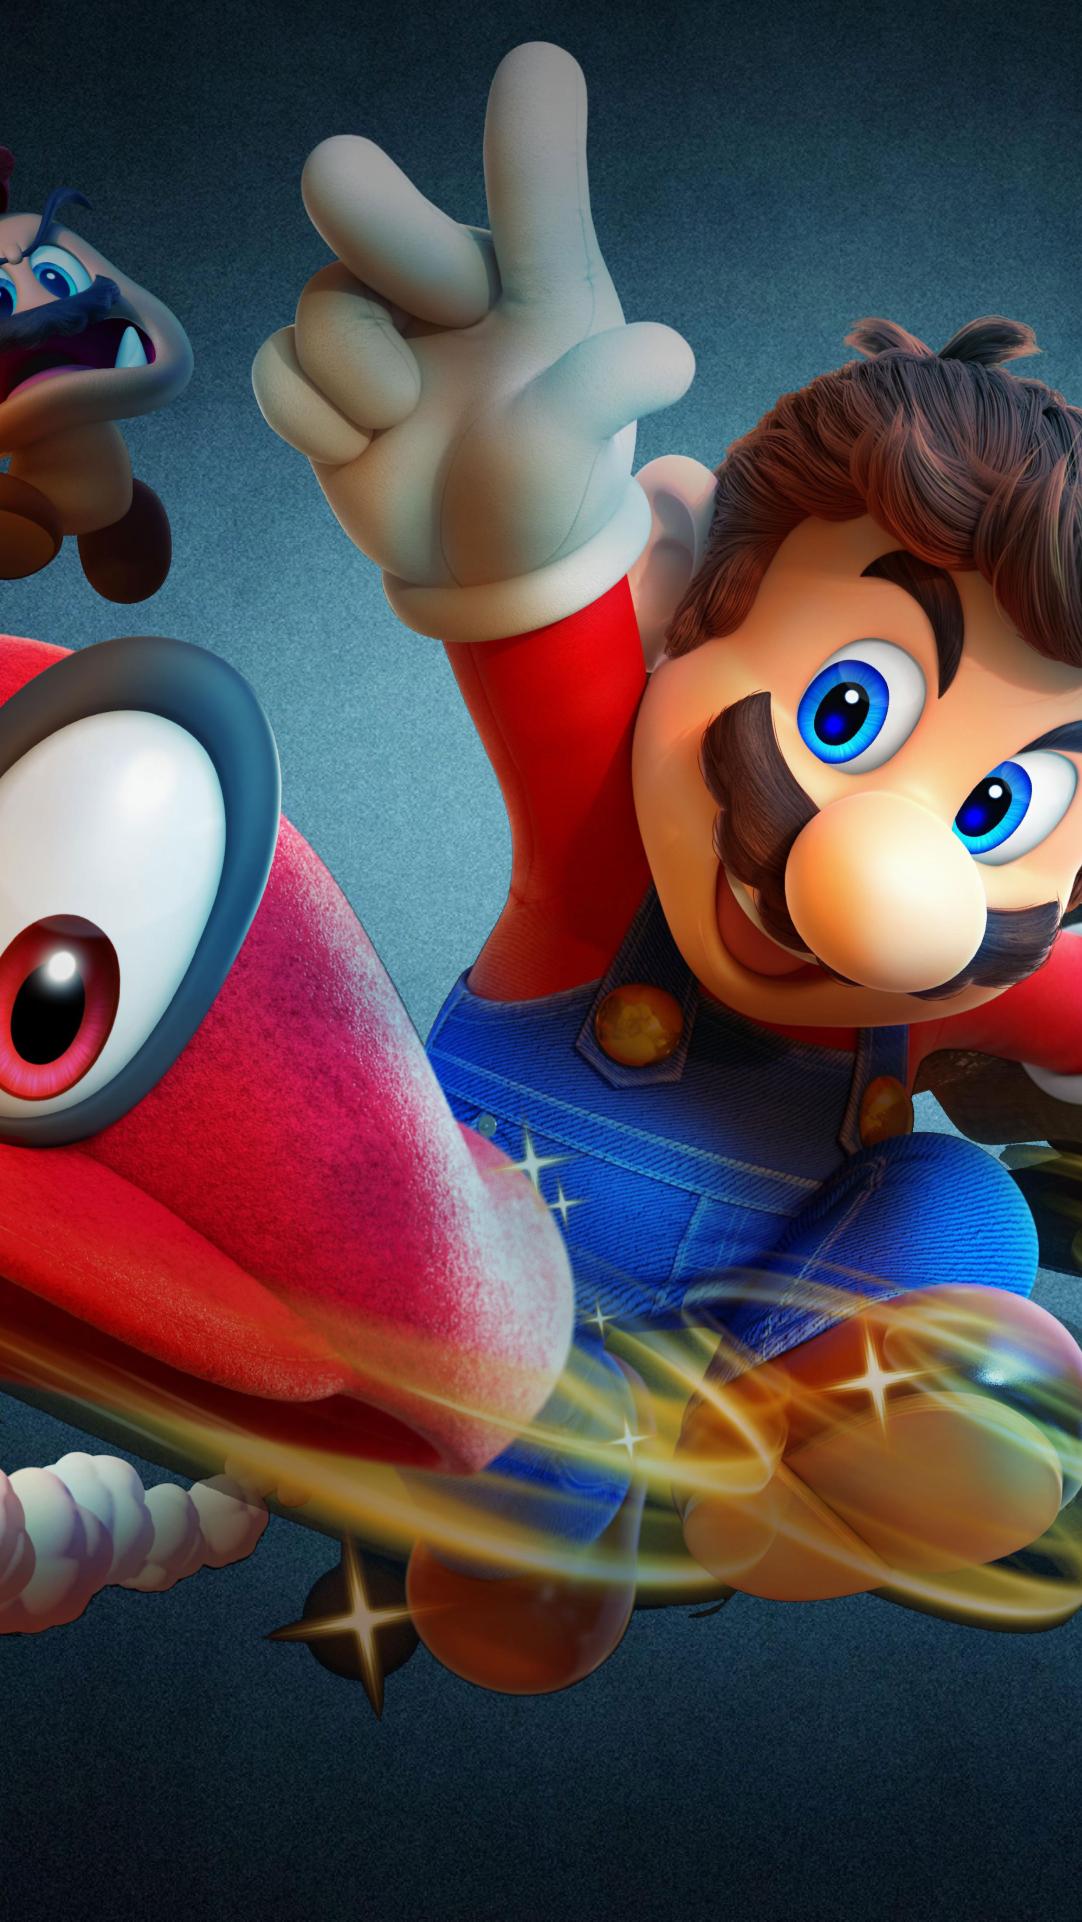 Super Mario Odyssey Wallpaper Hd Games 4k Wallpapers Images